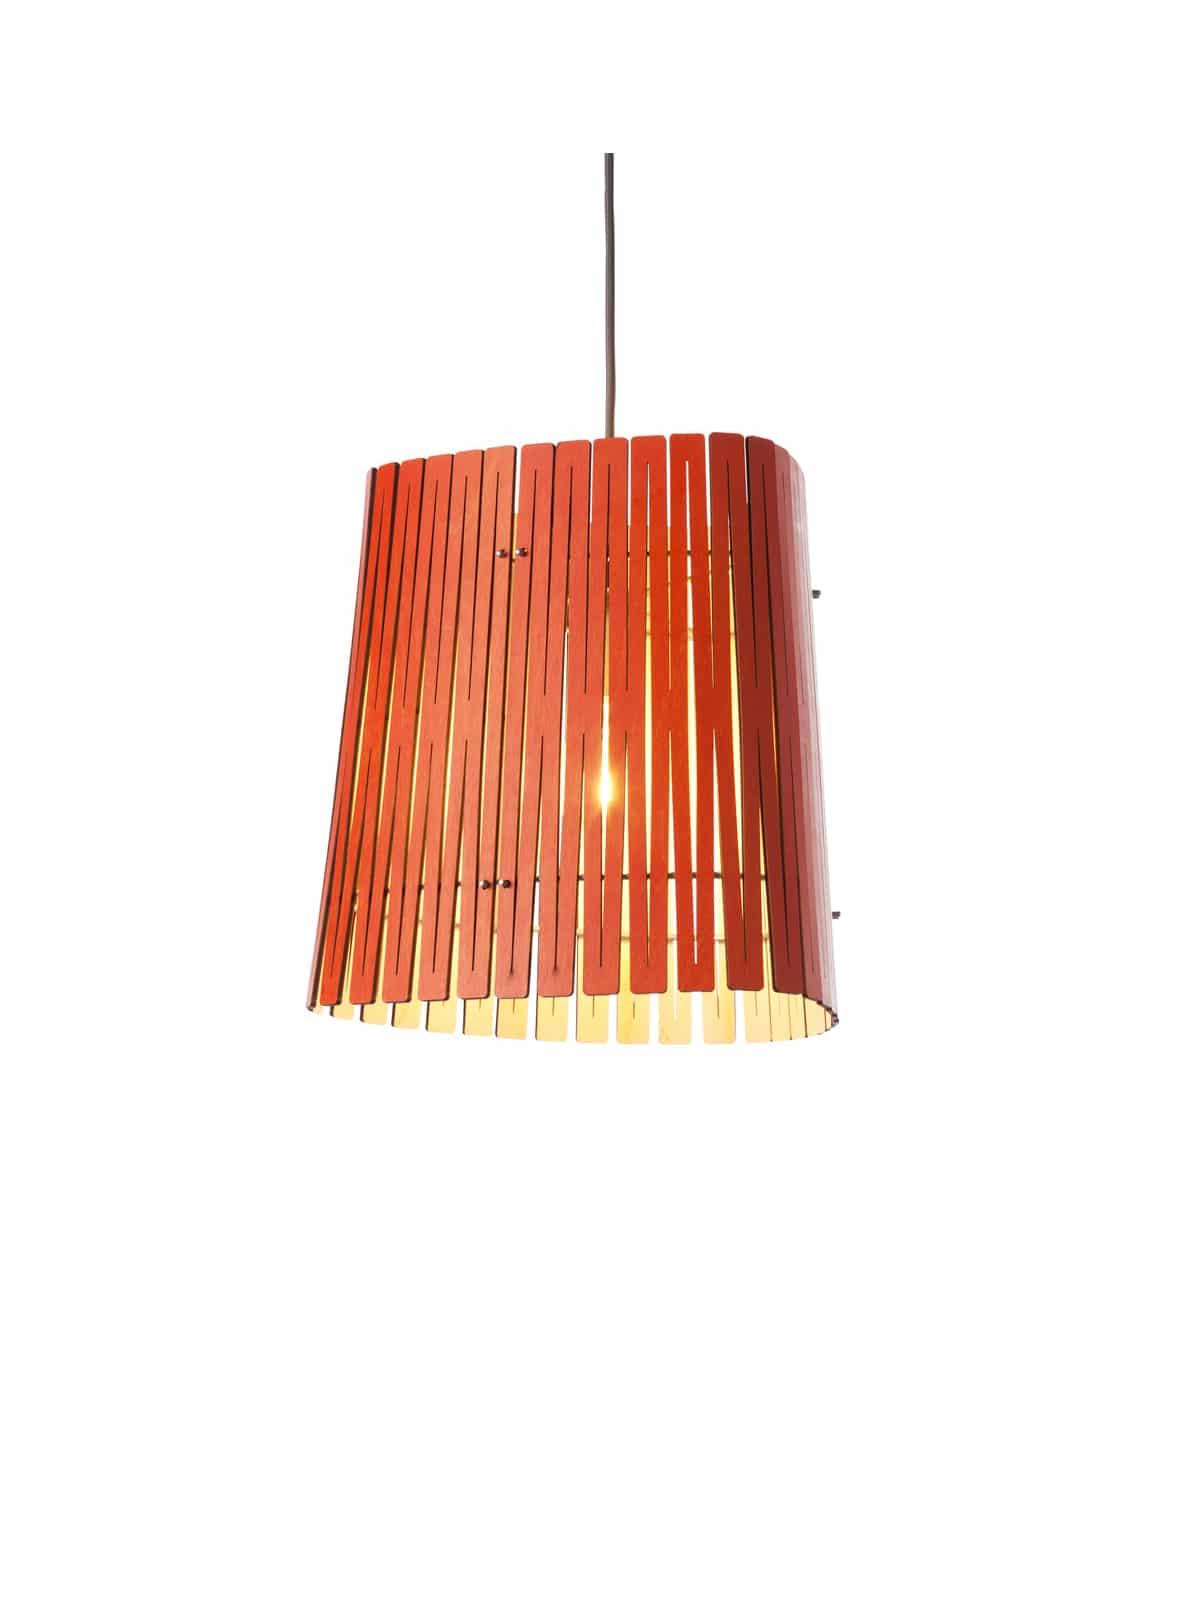 Holzlampe Kerflight P3 in Lava